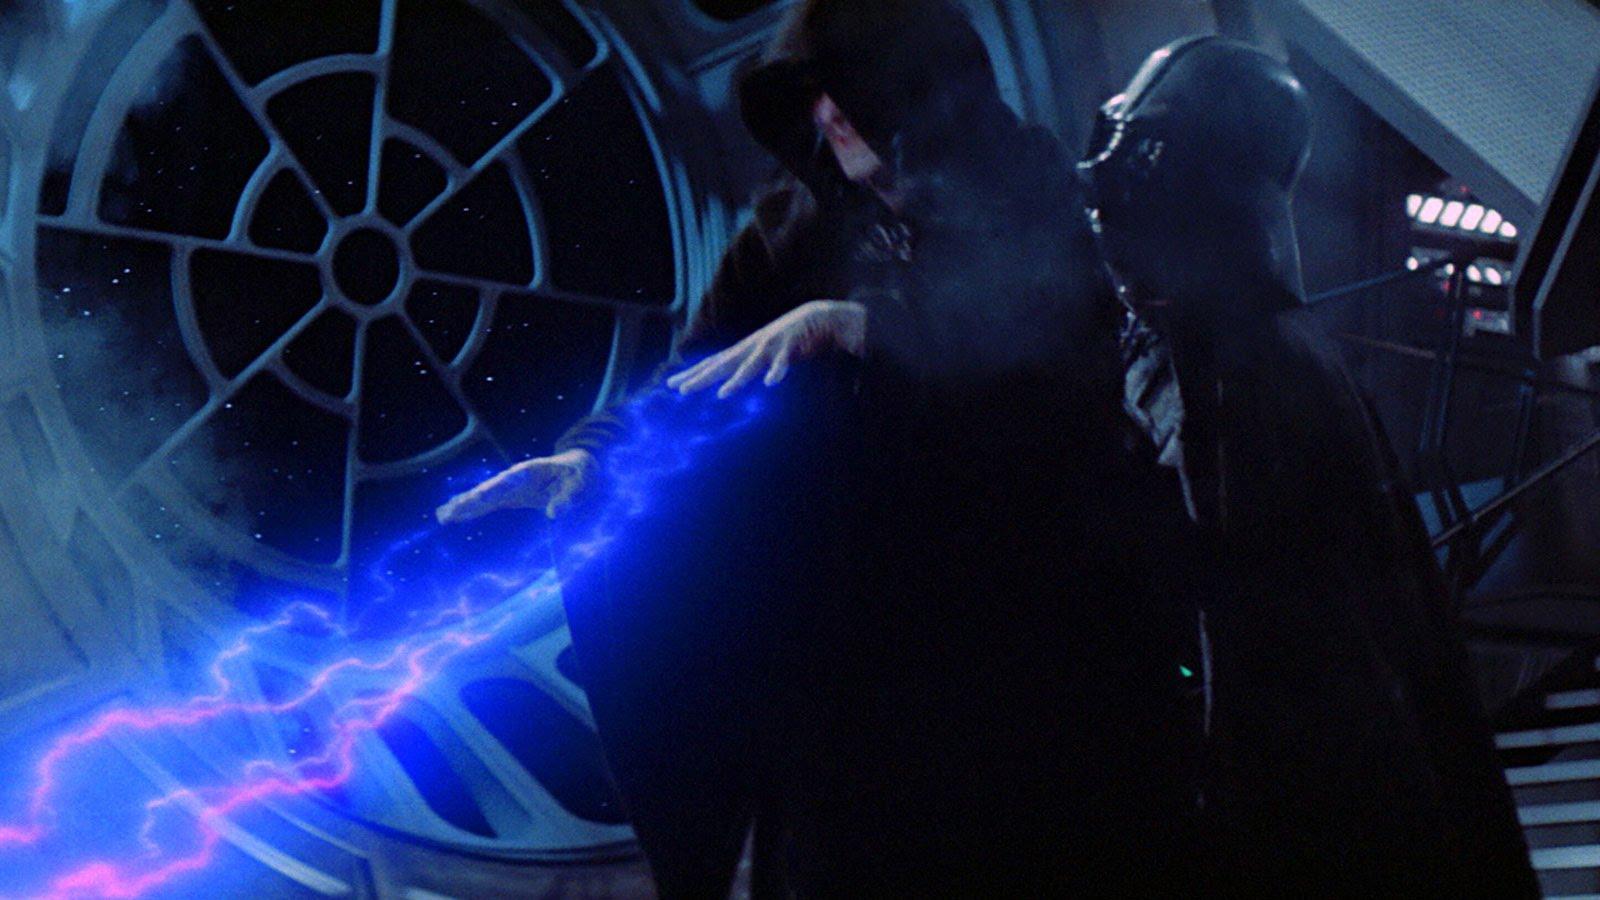 Vader kills the Emperor Star Wars Return of the Jedi